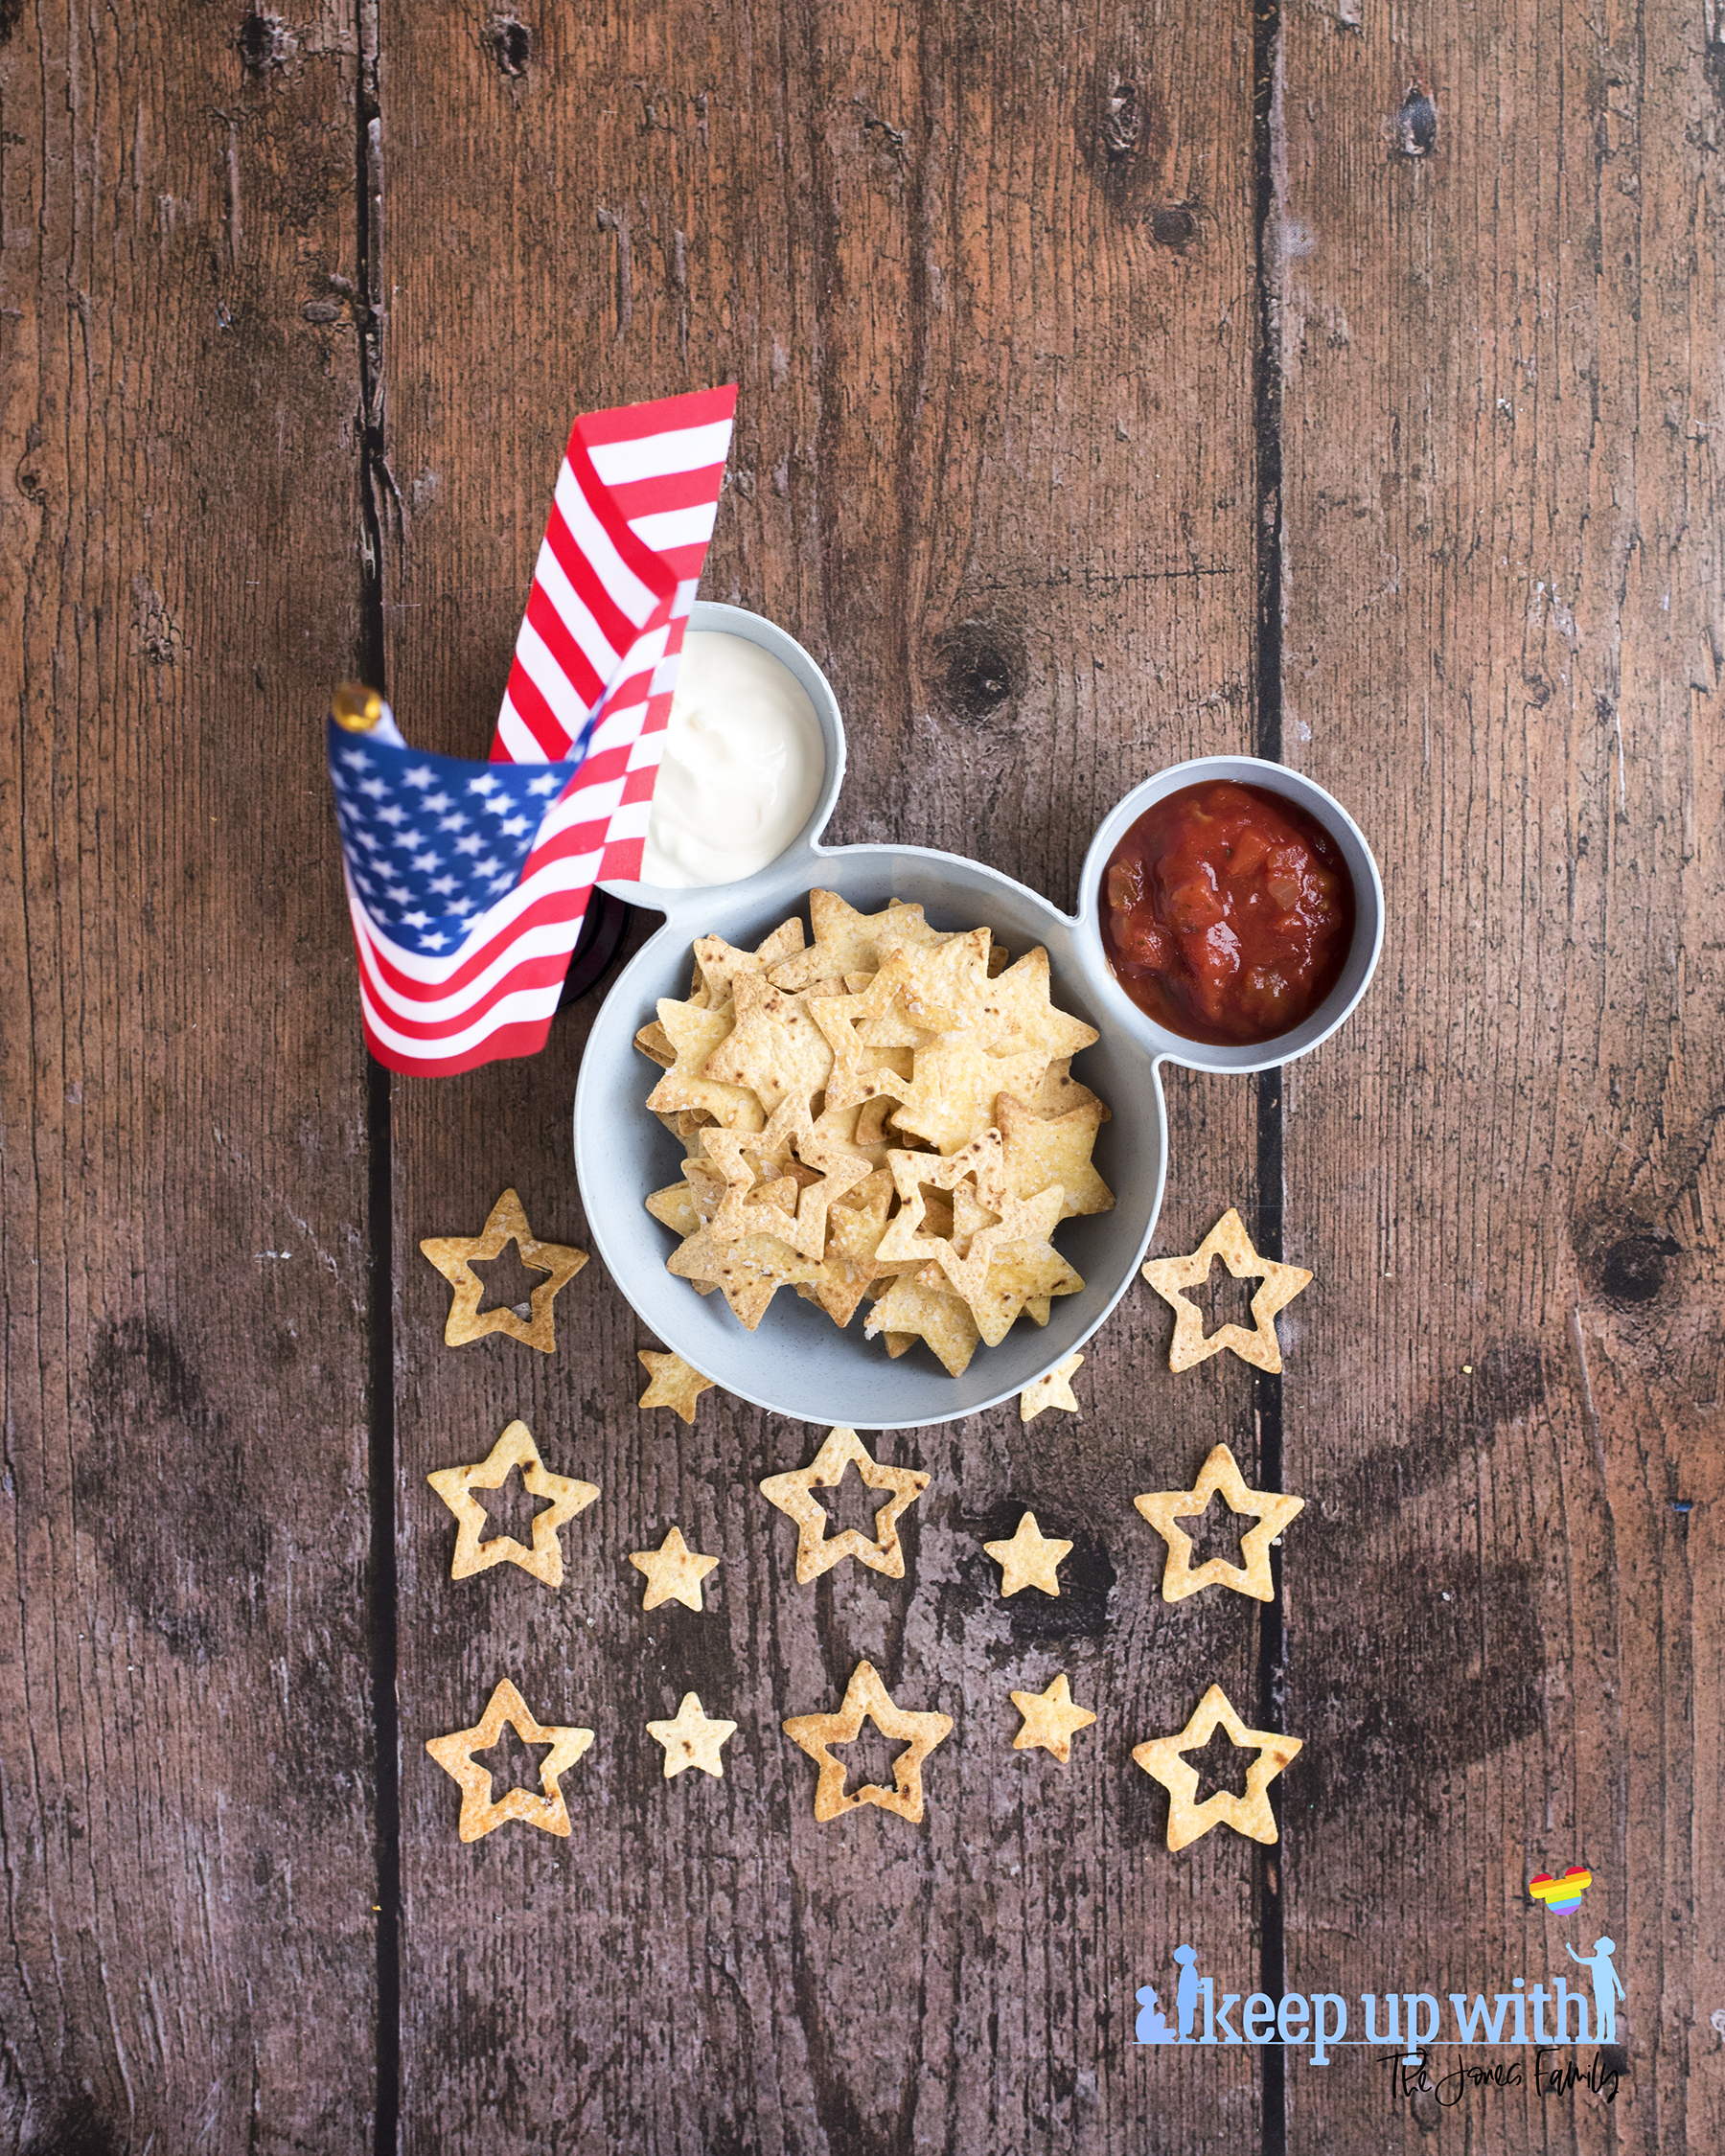 Star Spangled Chips 'n' Dip